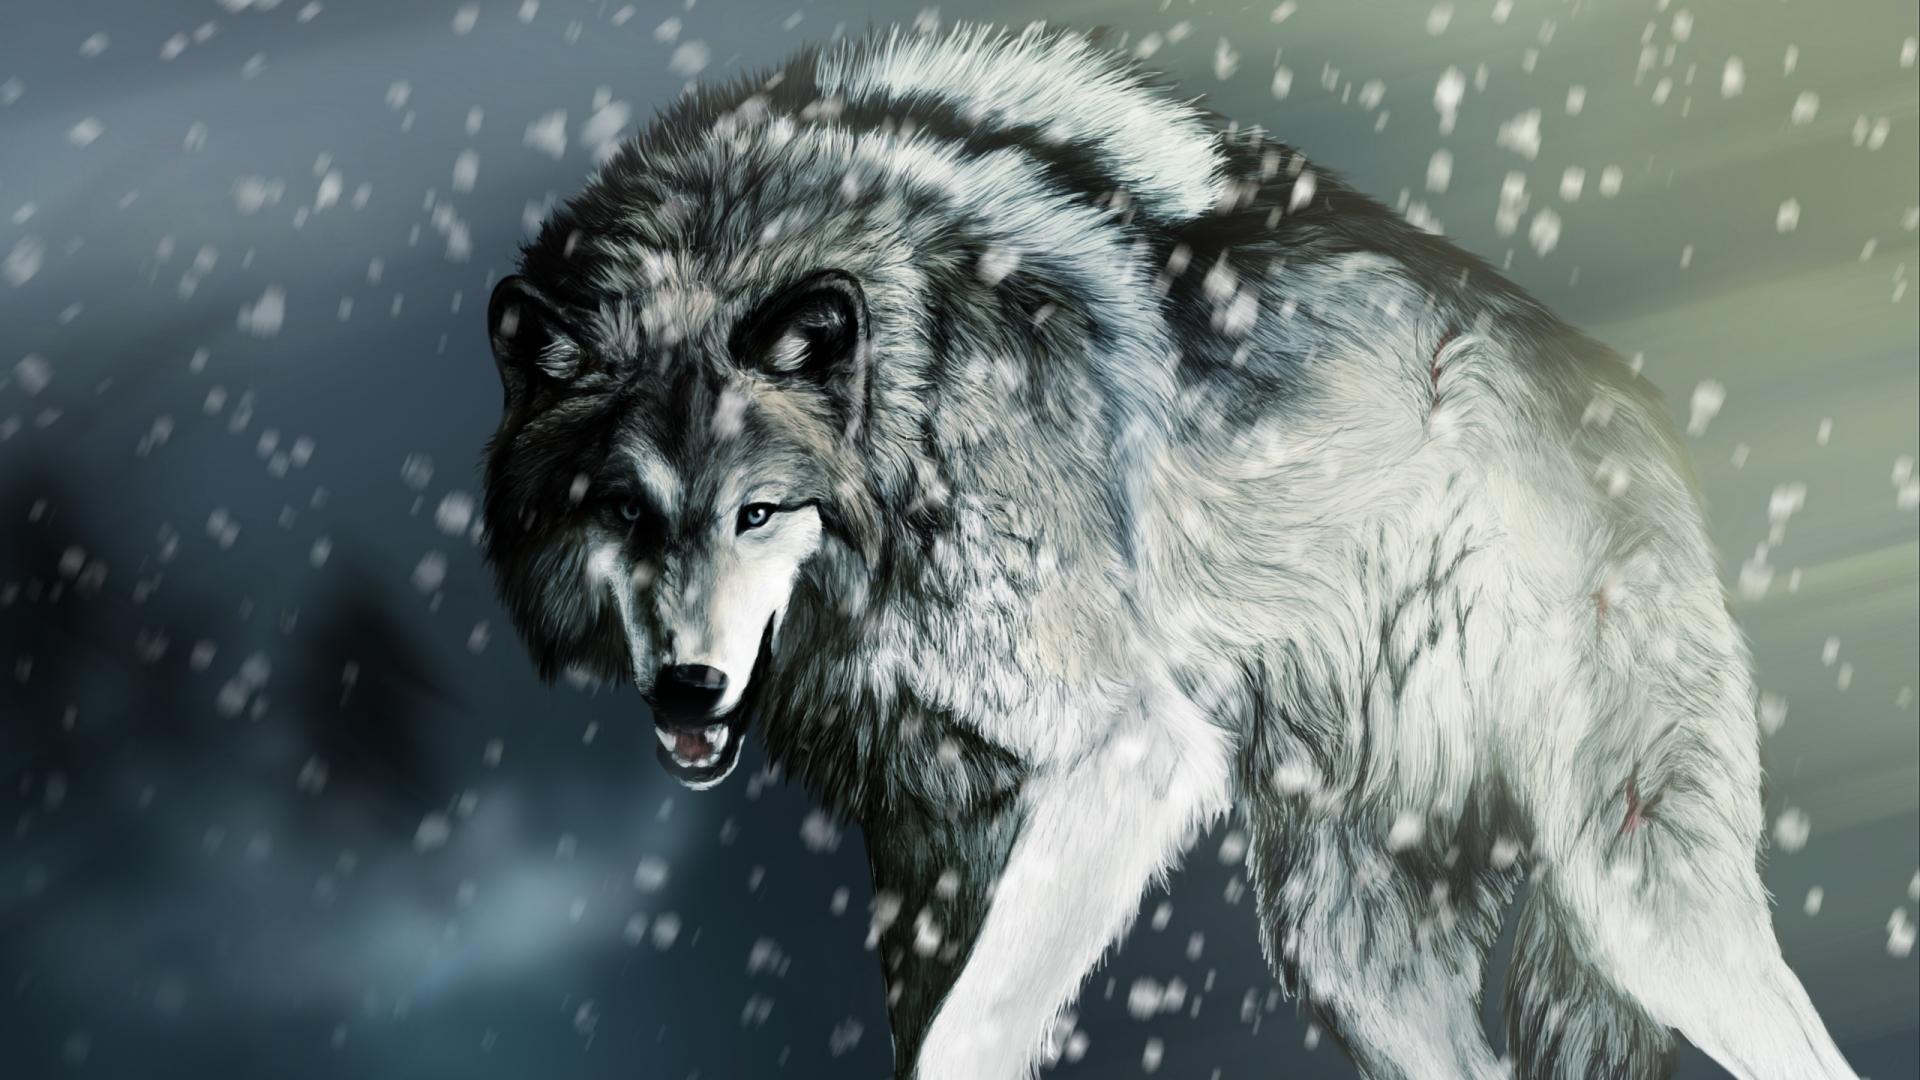 wolf hd deskto